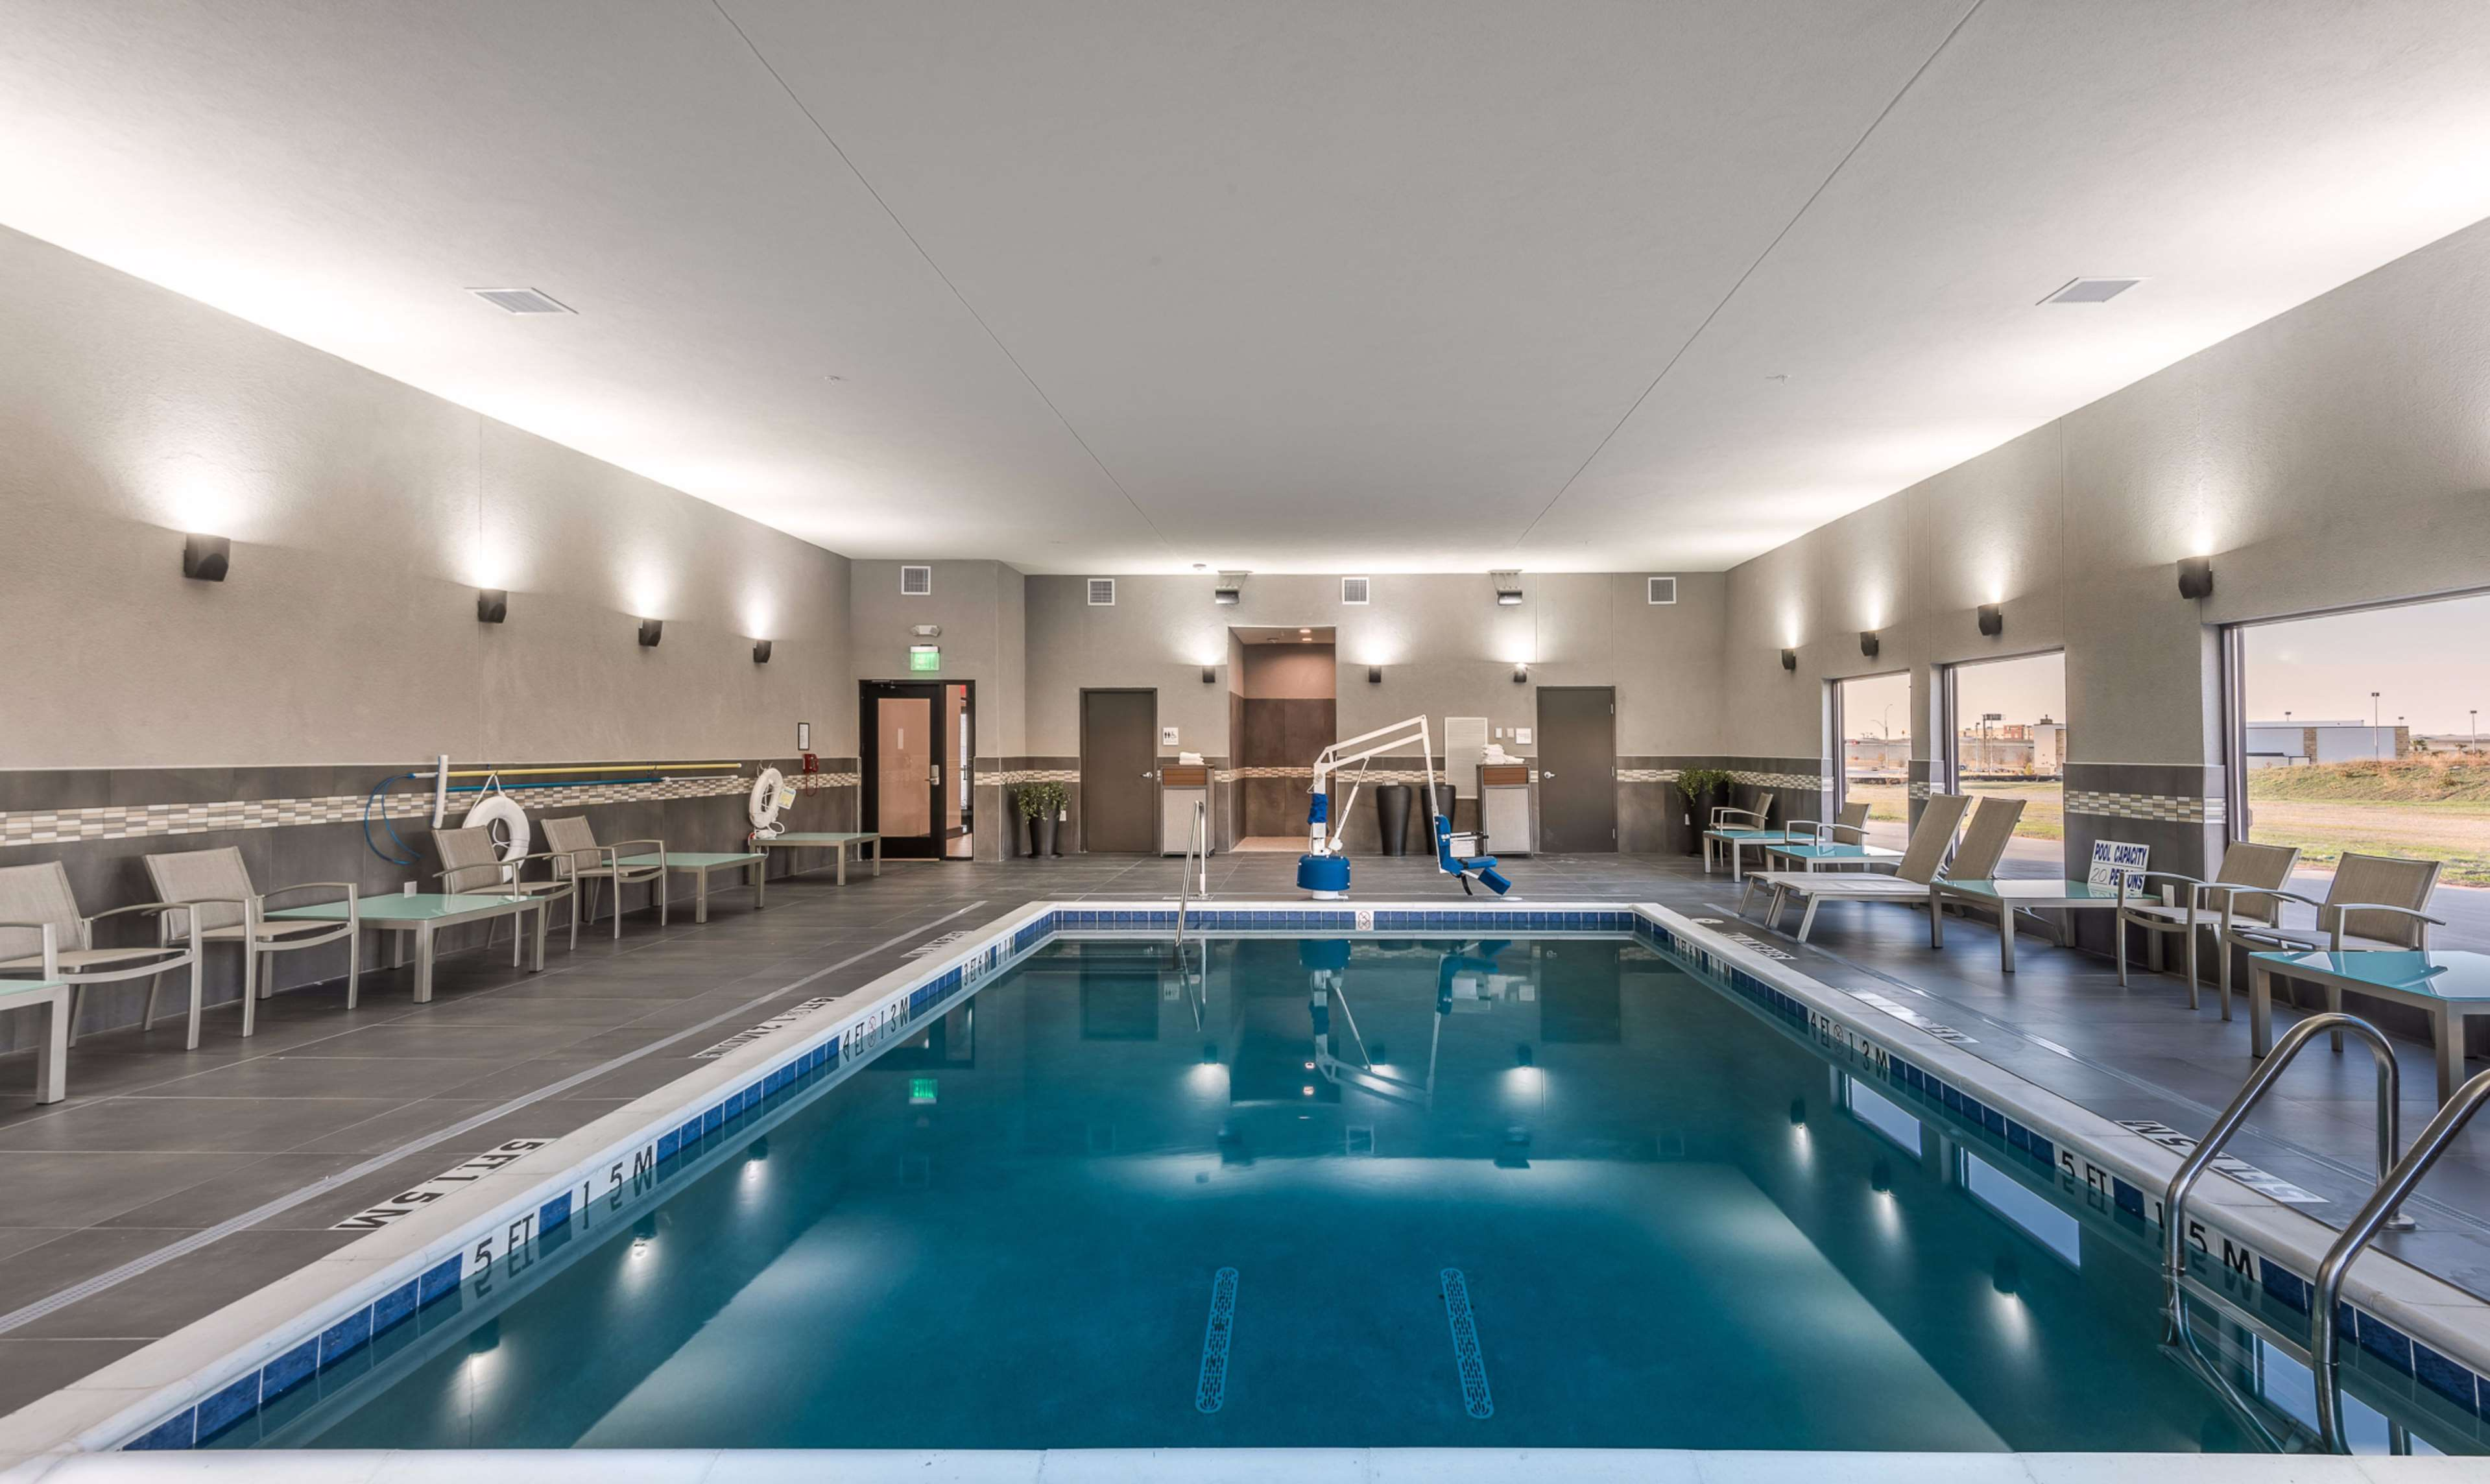 Hampton Inn & Suites Dallas-The Colony, TX image 9